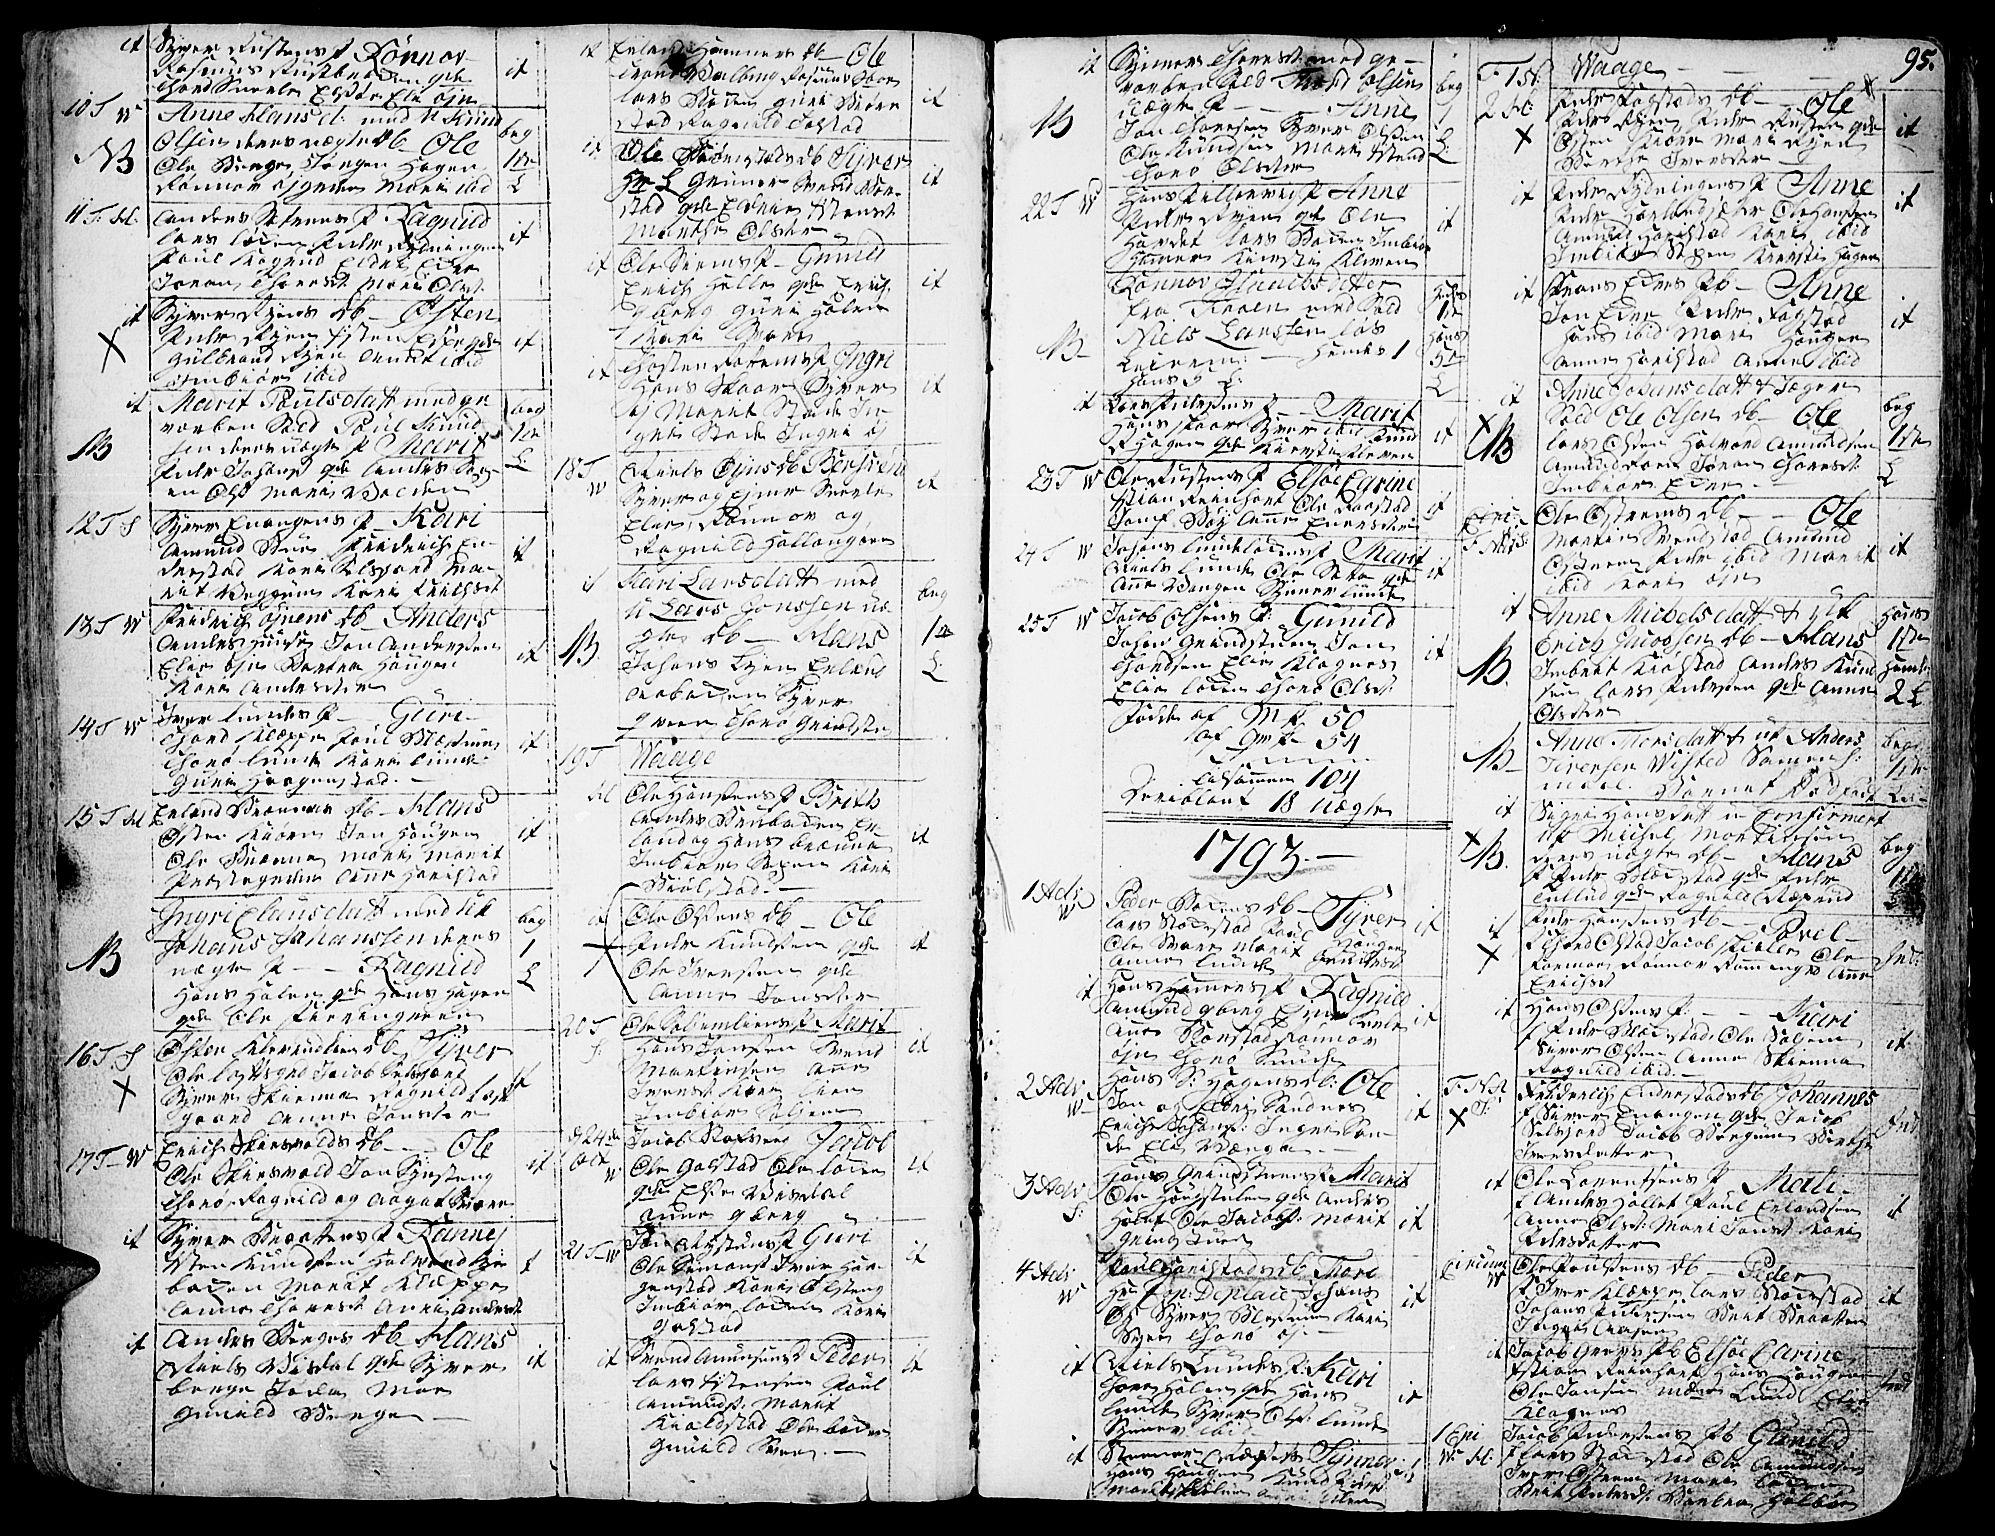 SAH, Vågå prestekontor, Ministerialbok nr. 1, 1739-1810, s. 95